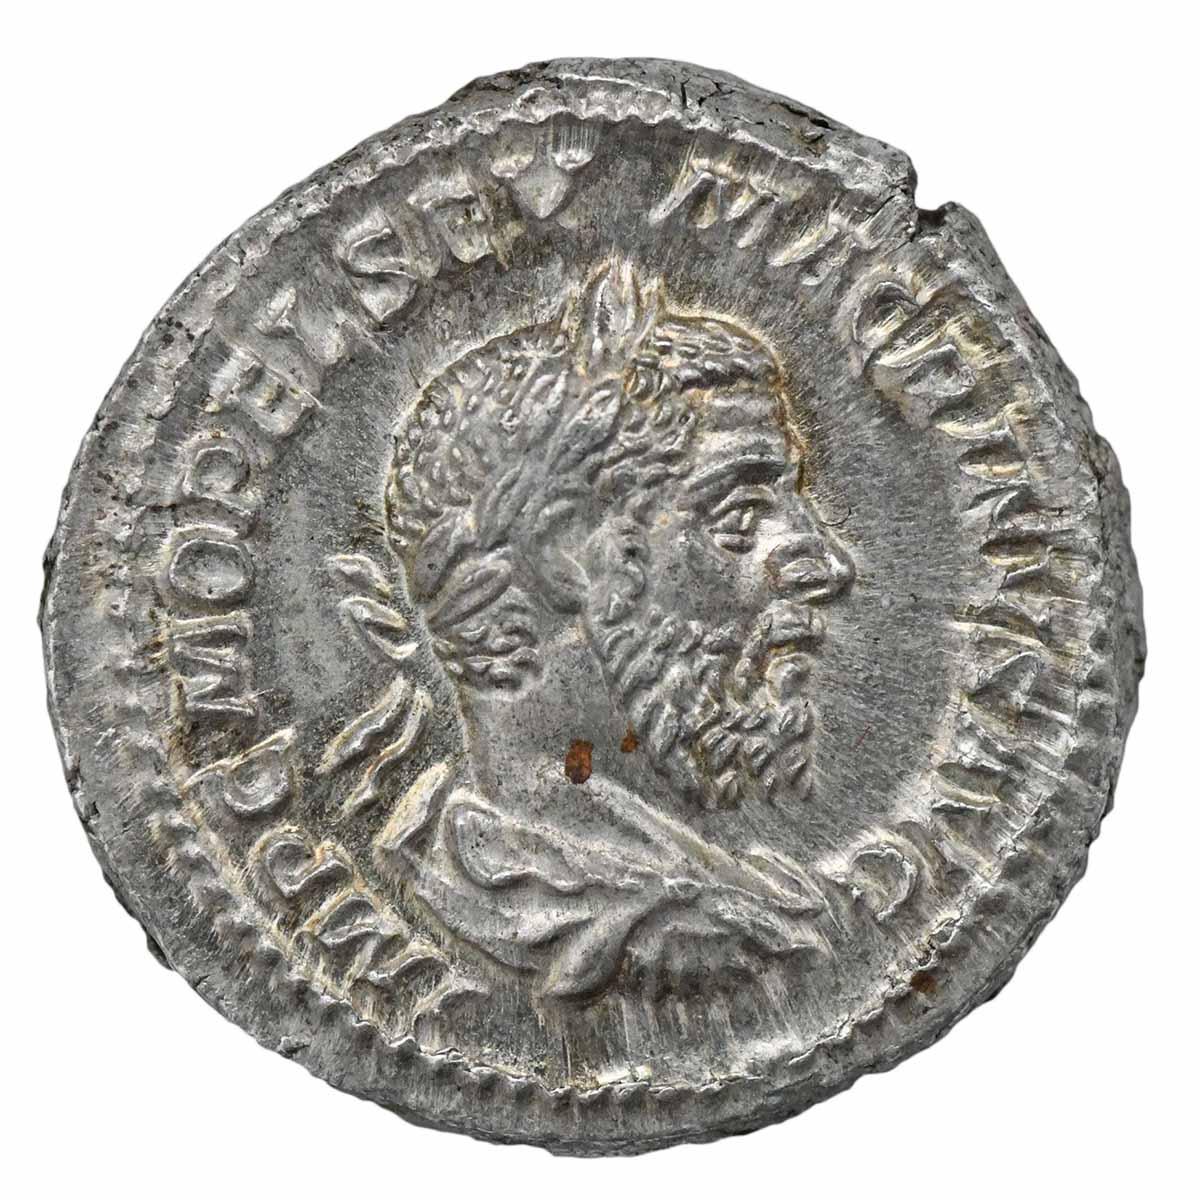 Moneta in argento di Roma Denario di Macrino